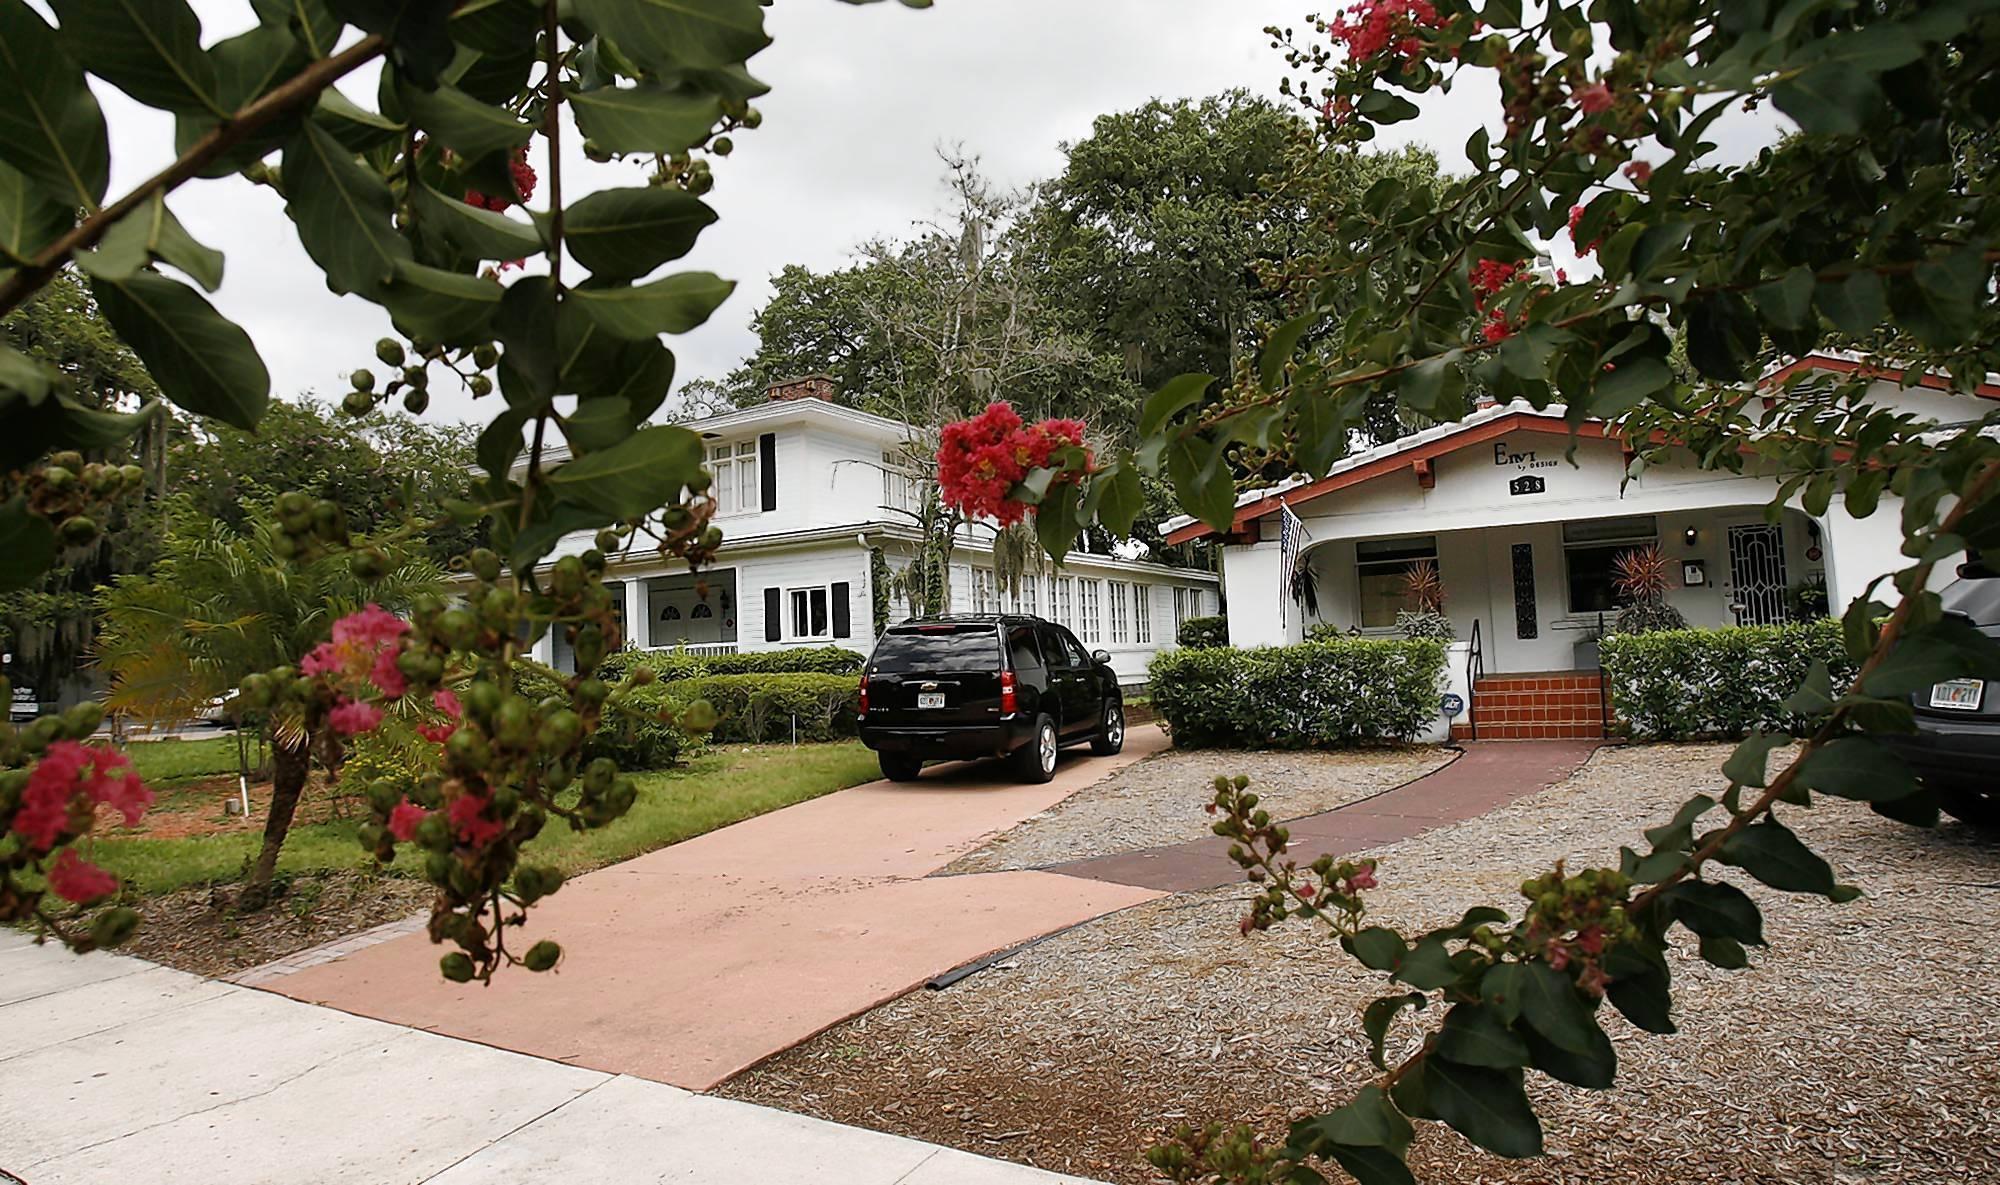 These two houses on East Washington Street in downtown Orlando border Lake Eola Park.